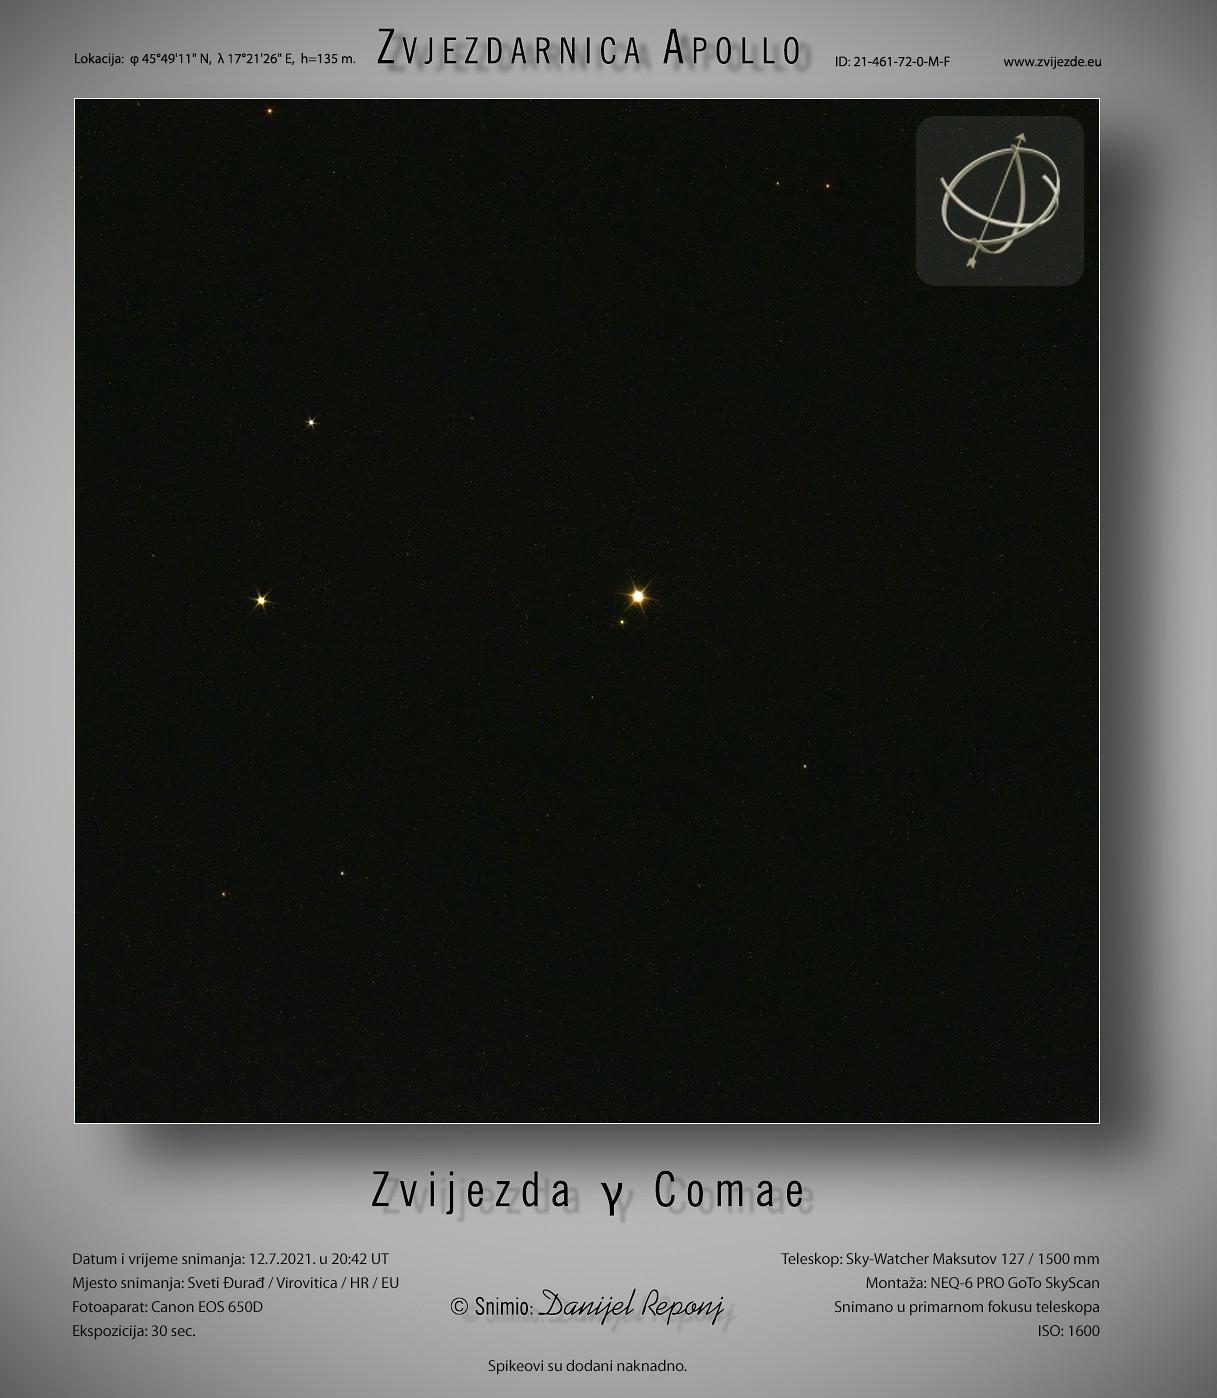 Zvijezda gama Berenikine kose, 12.7.2021.